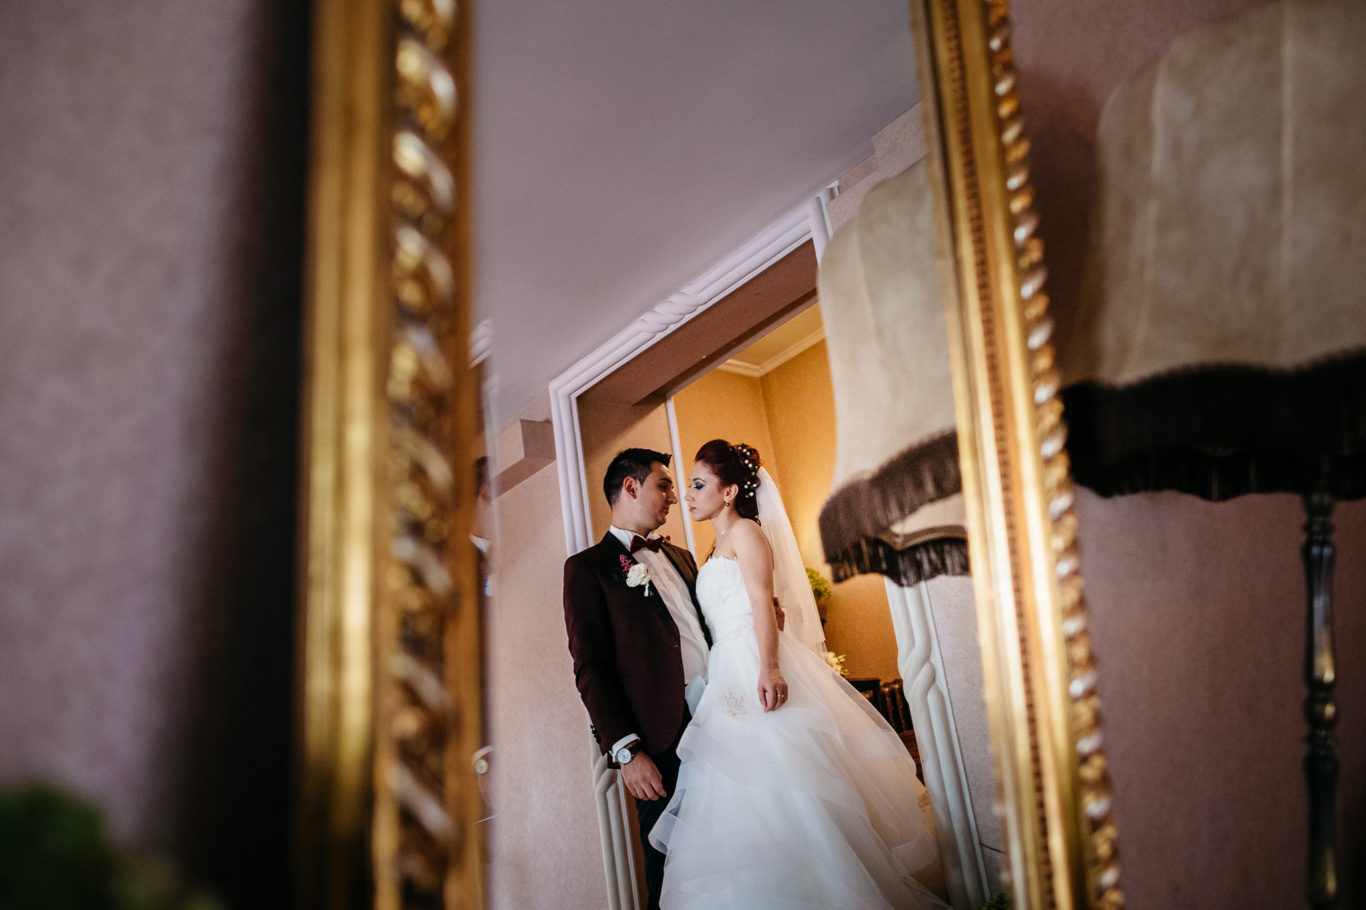 0247-fotografie-nunta-bucuresti-cristina-nicusor-fotograf-ciprian-dumitrescu-dc1_0174